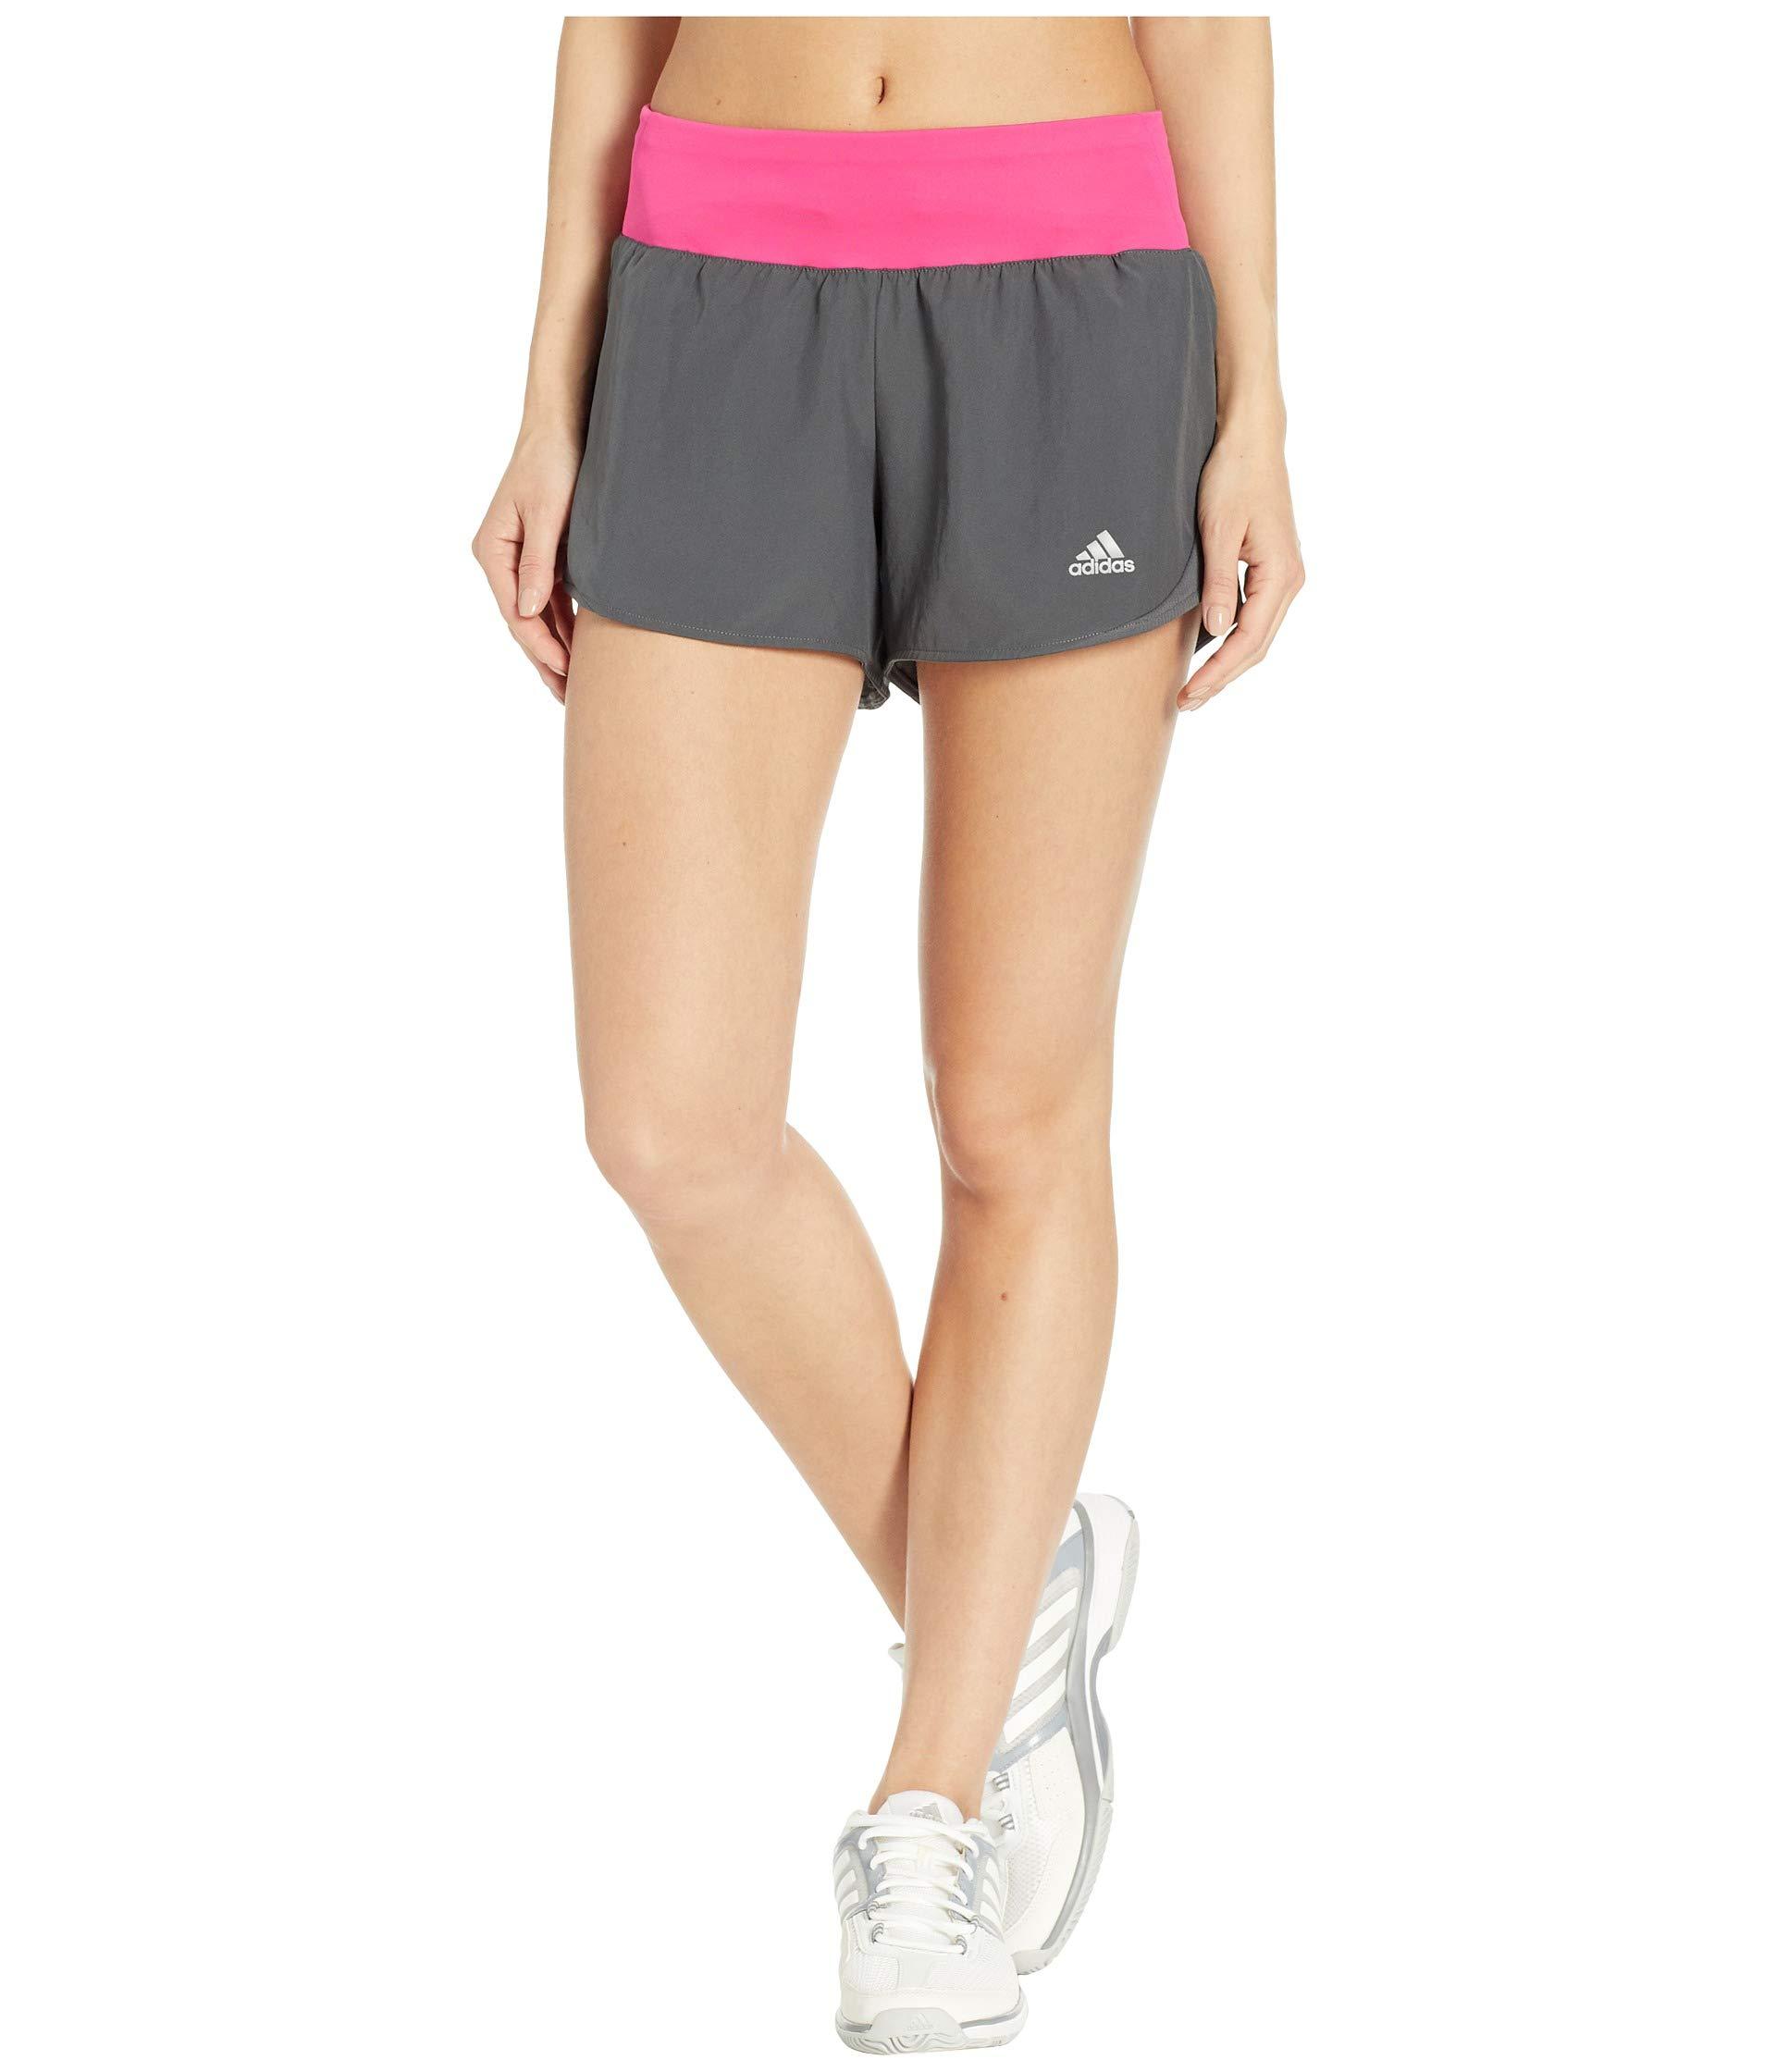 adidas Women's Run It Shorts, Grey/Real Magenta, X-Small 3''